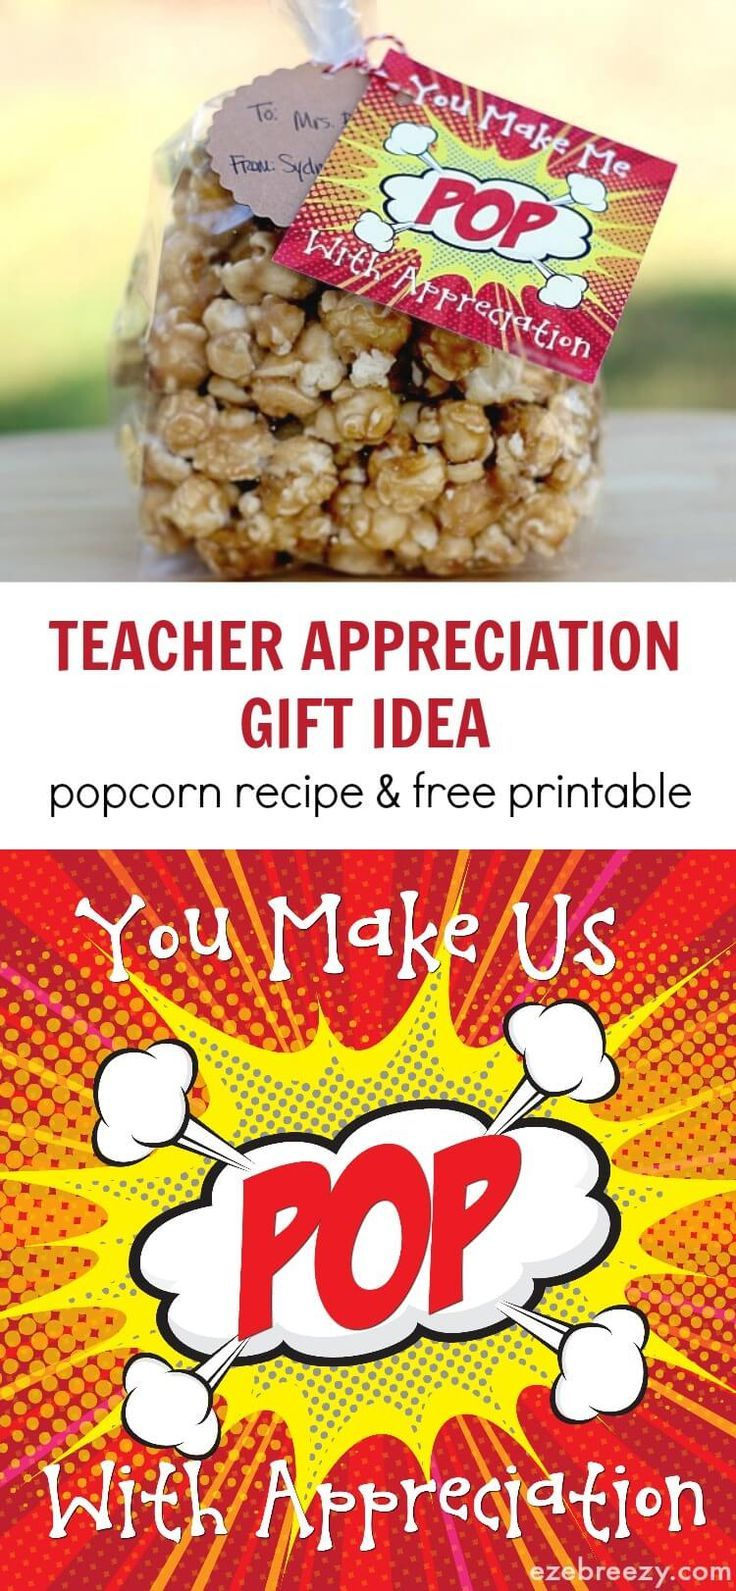 Popcorn Teacher Appreciation Gift Idea with recipe and free printable!  Warning...this popcorn it addicting:) - ezebreezy.com